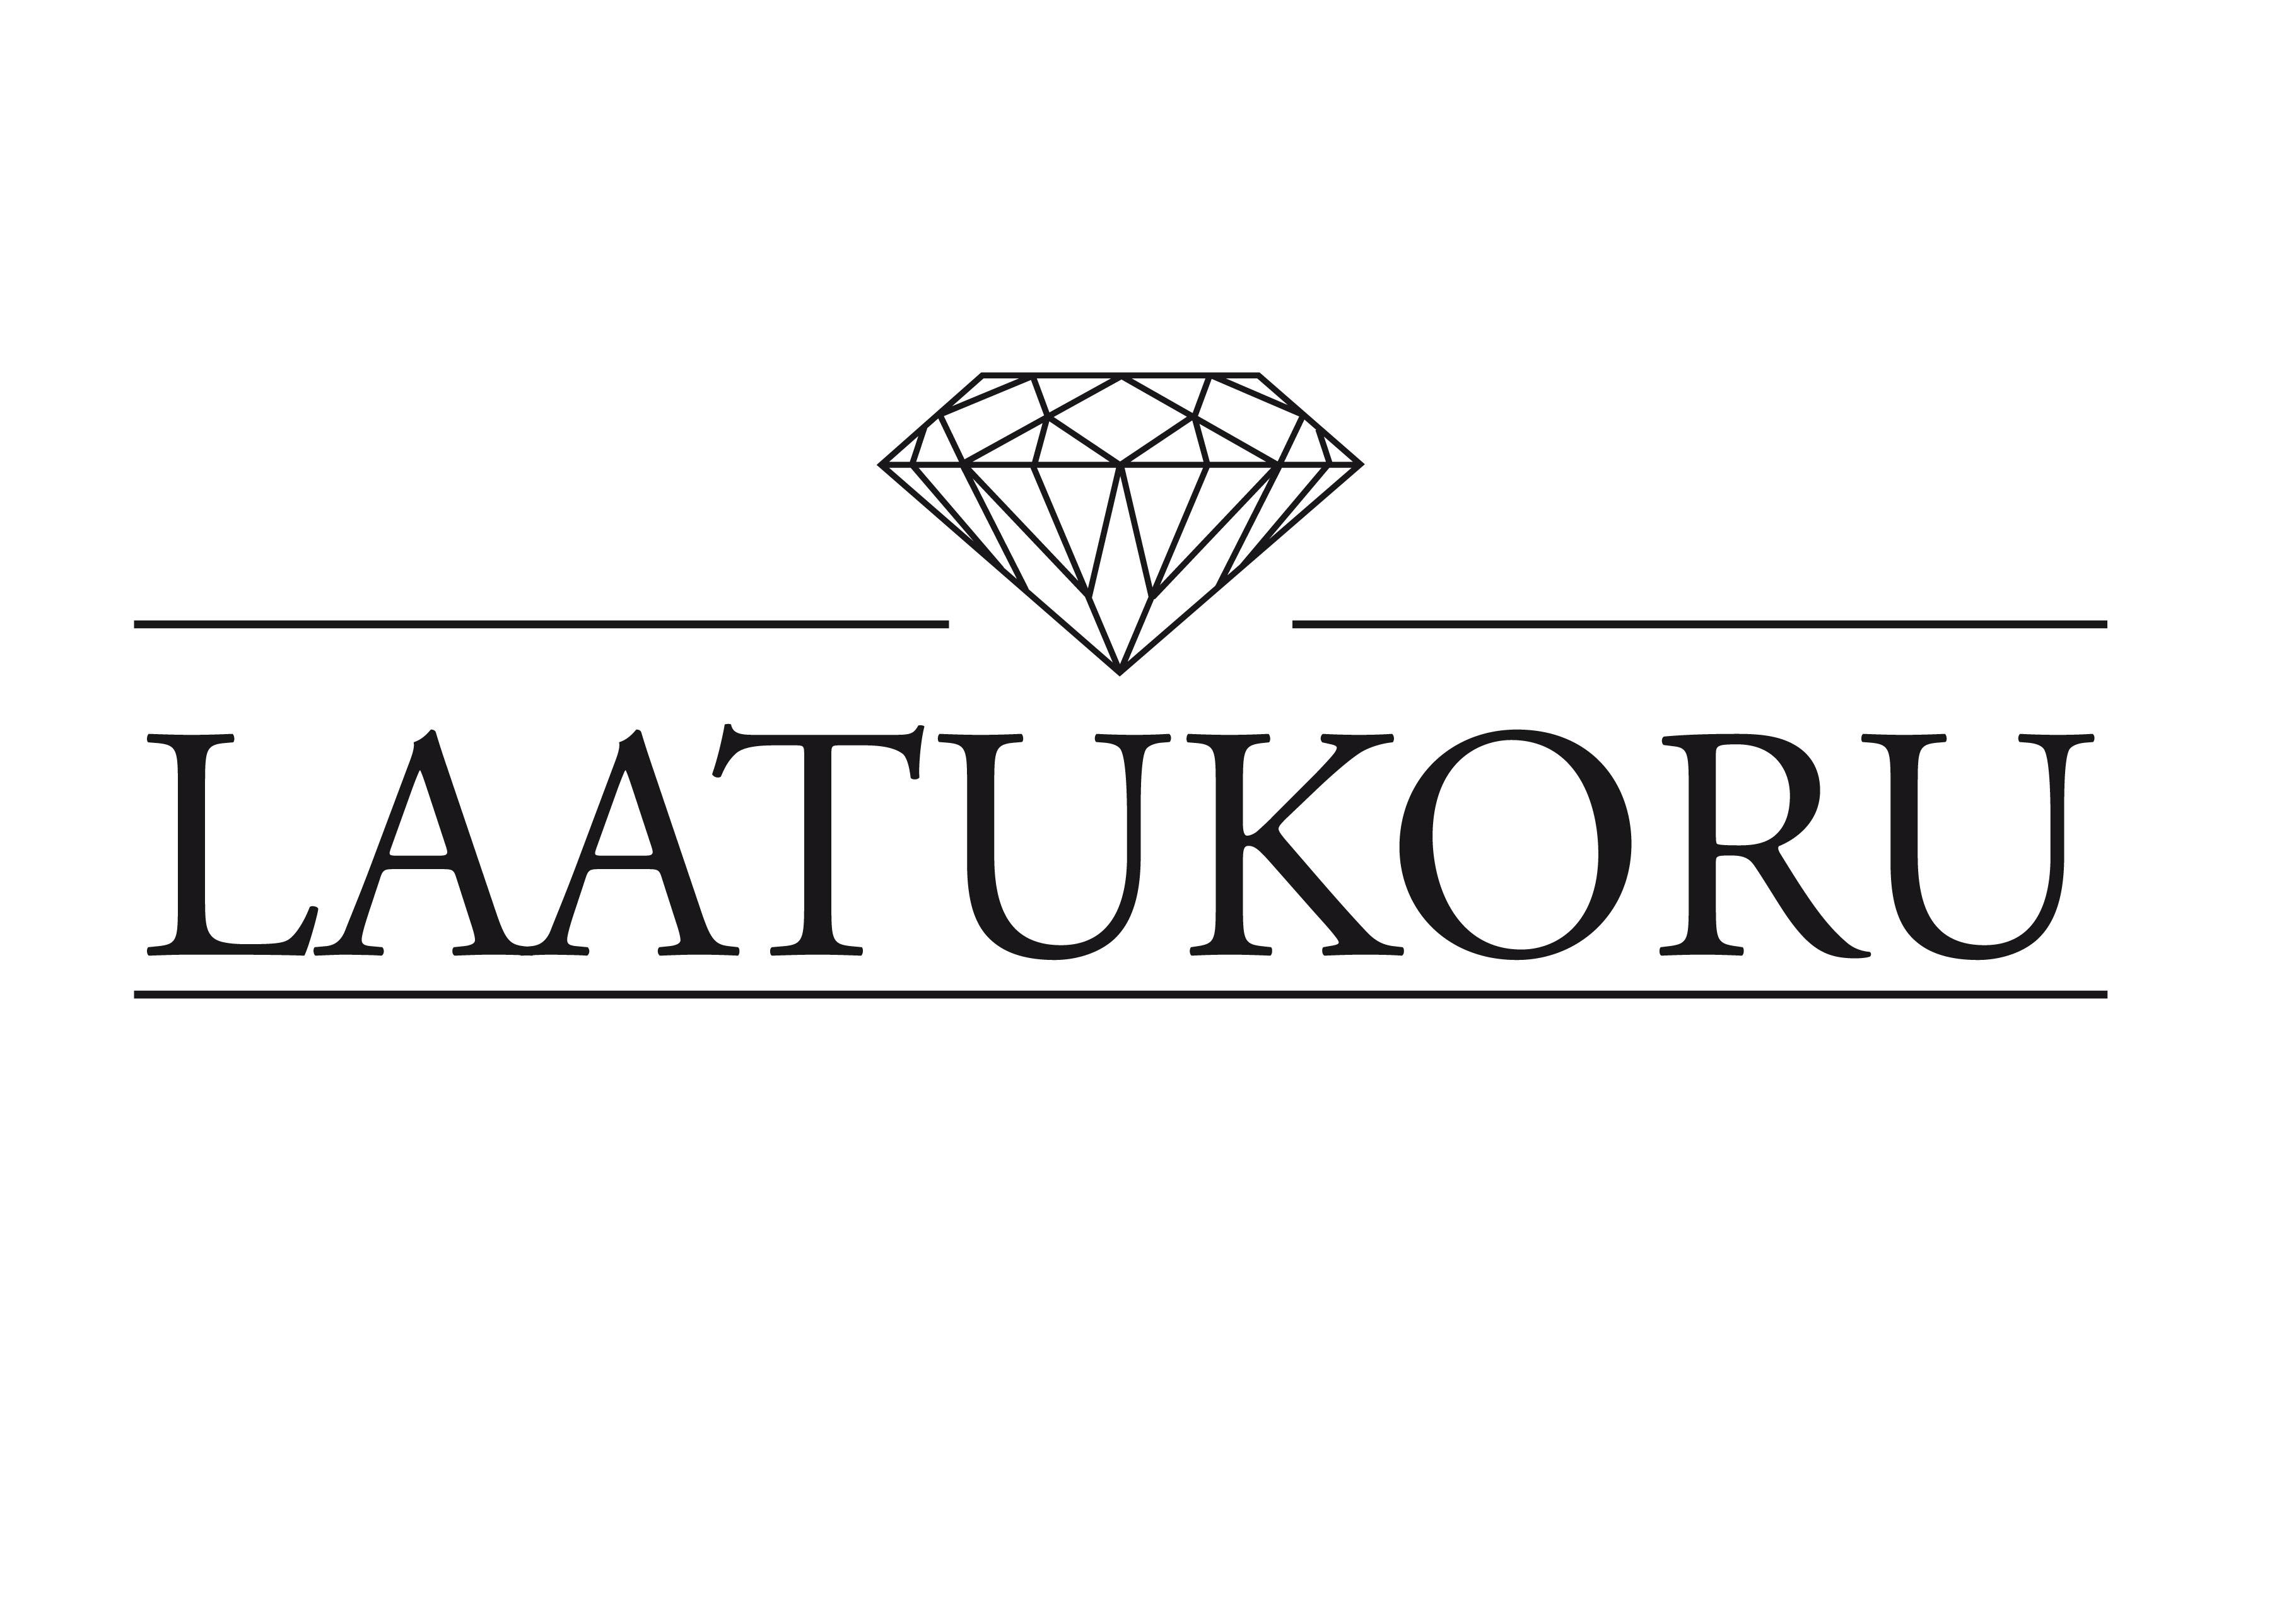 Laatukoru Oy logo